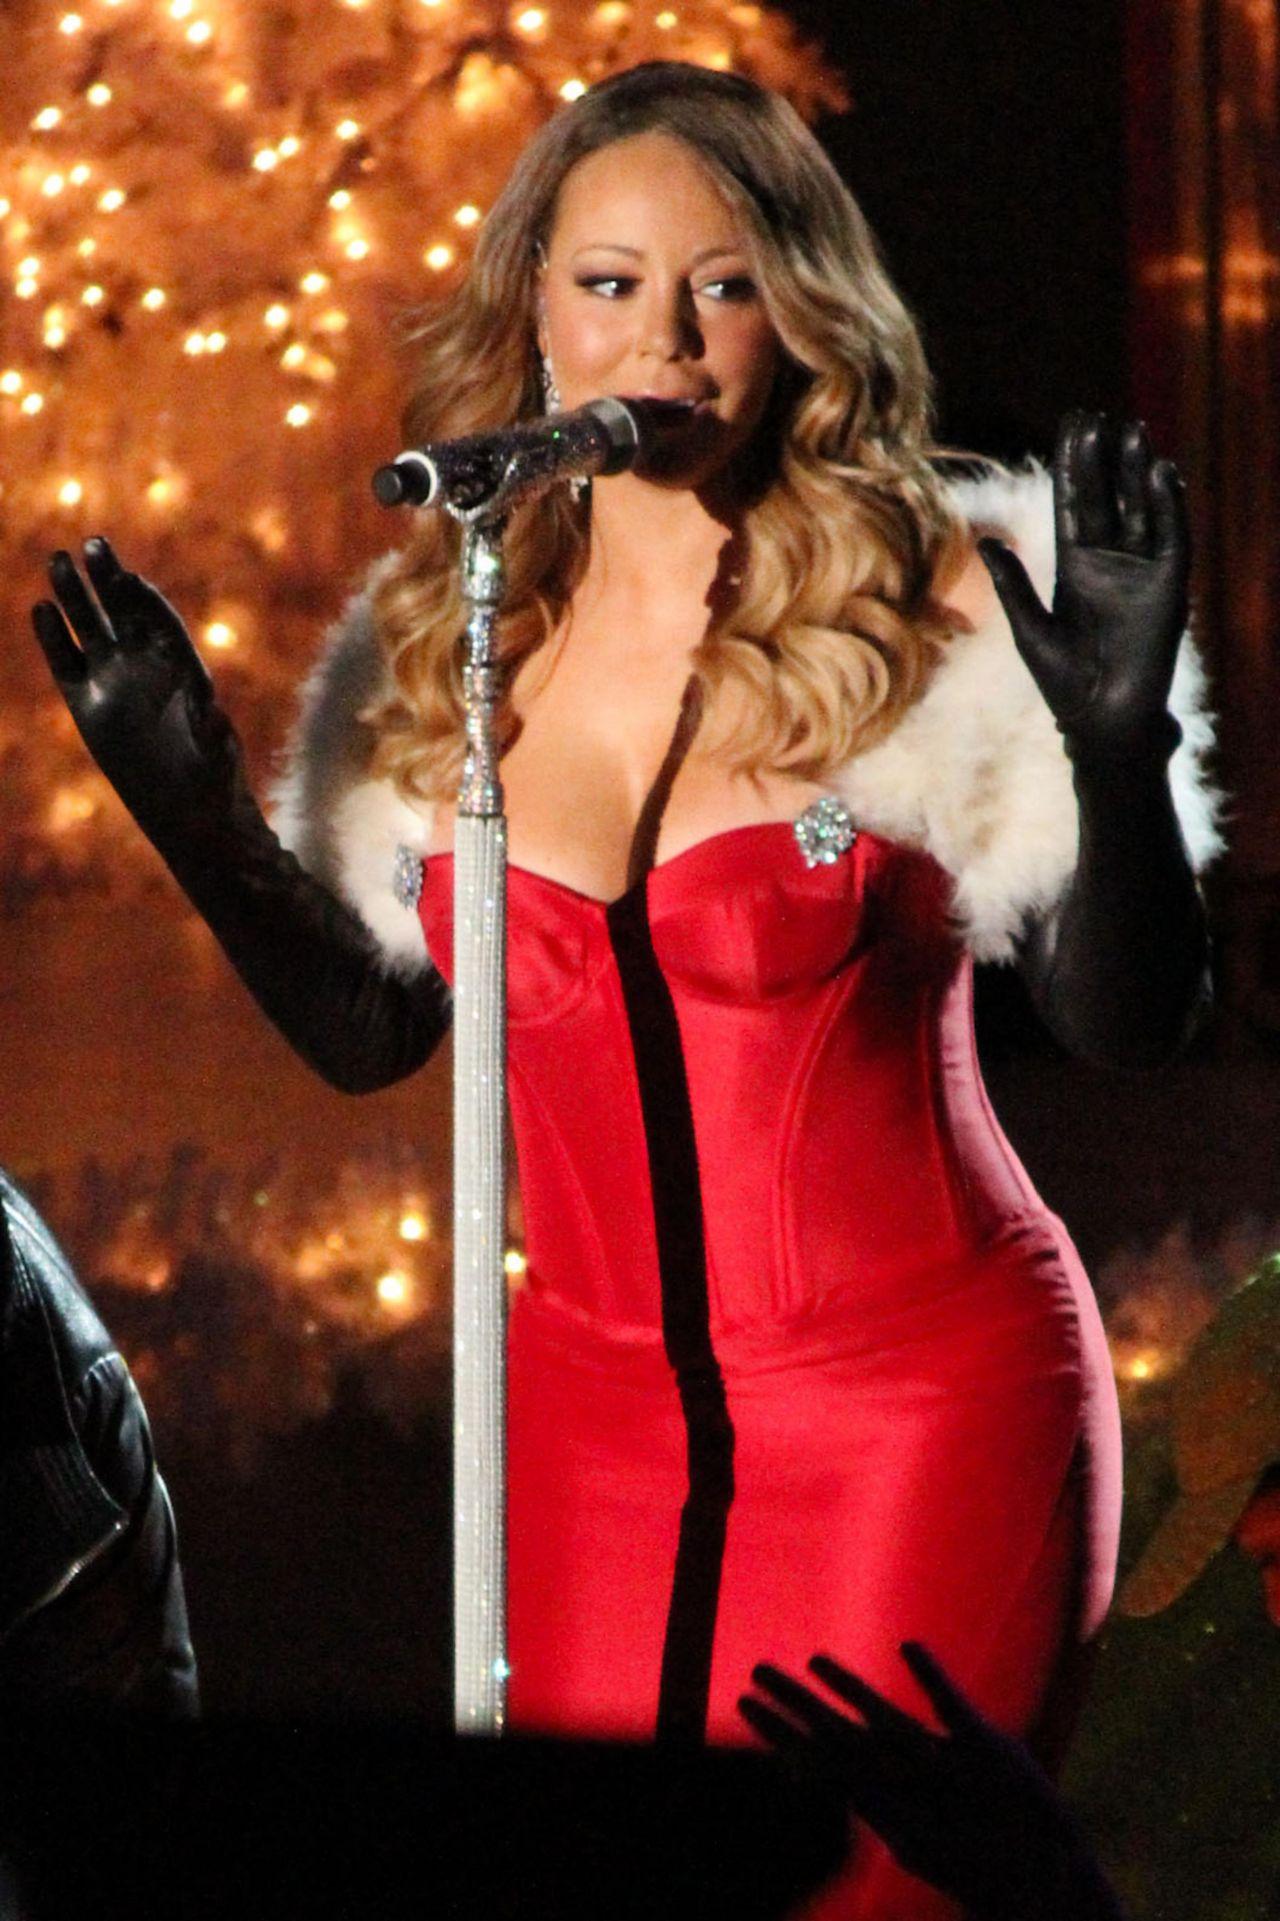 Mariah Carey Performs At 81st Annual Rockefeller Center